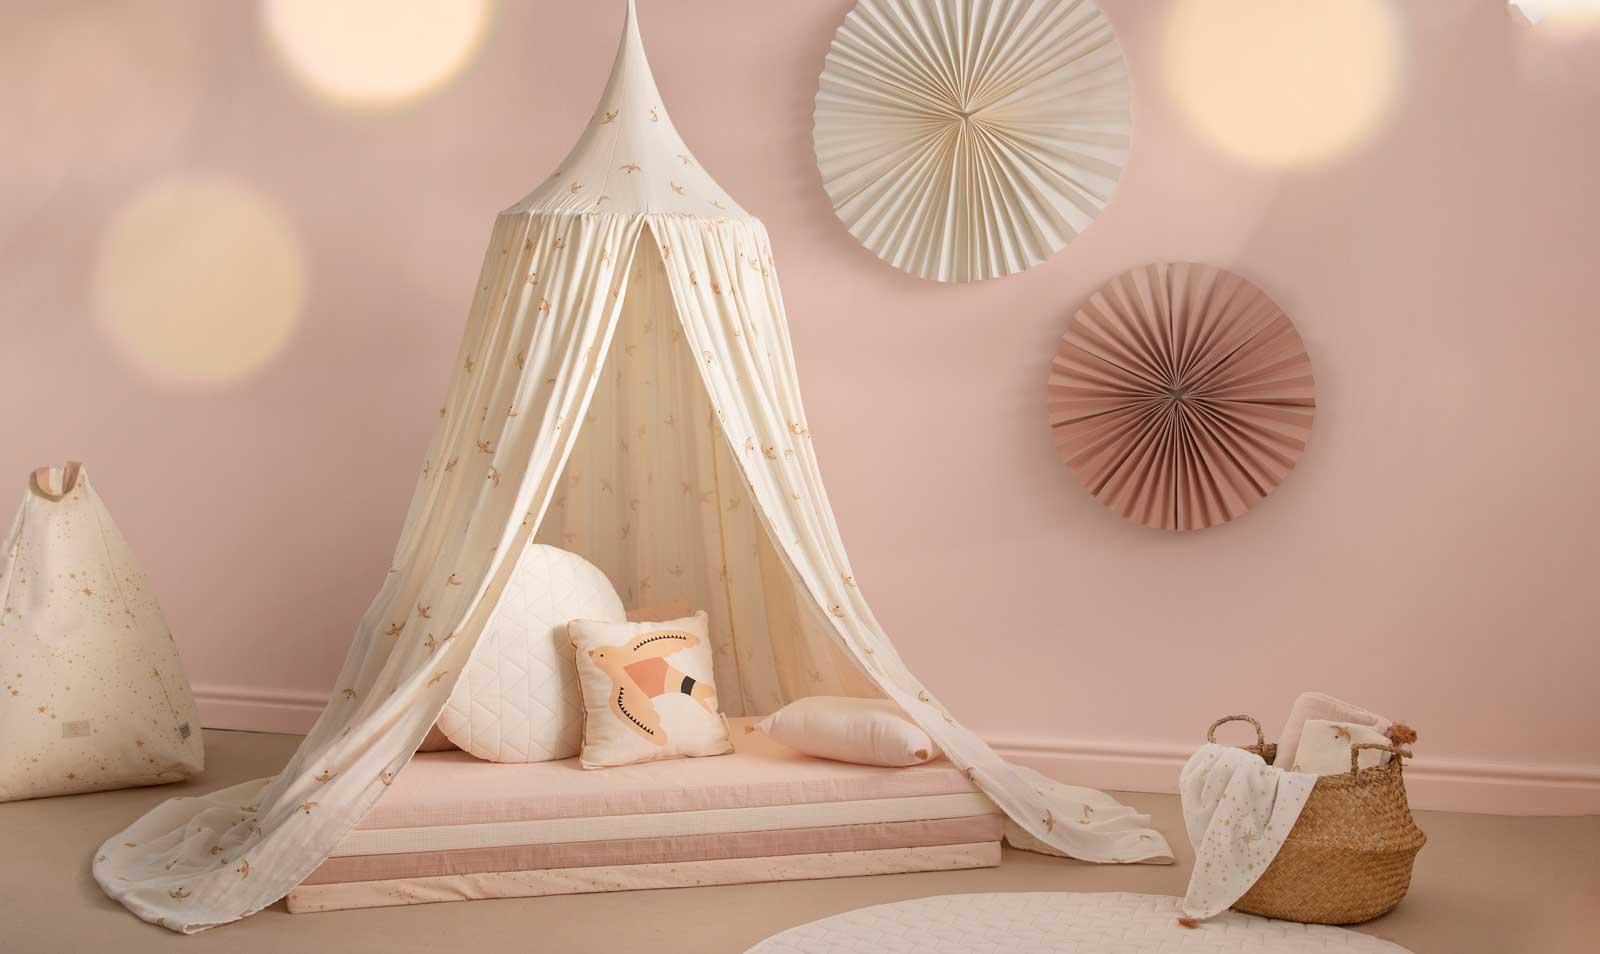 nobodinoz mood canopy amour haiku birds ciel de lit